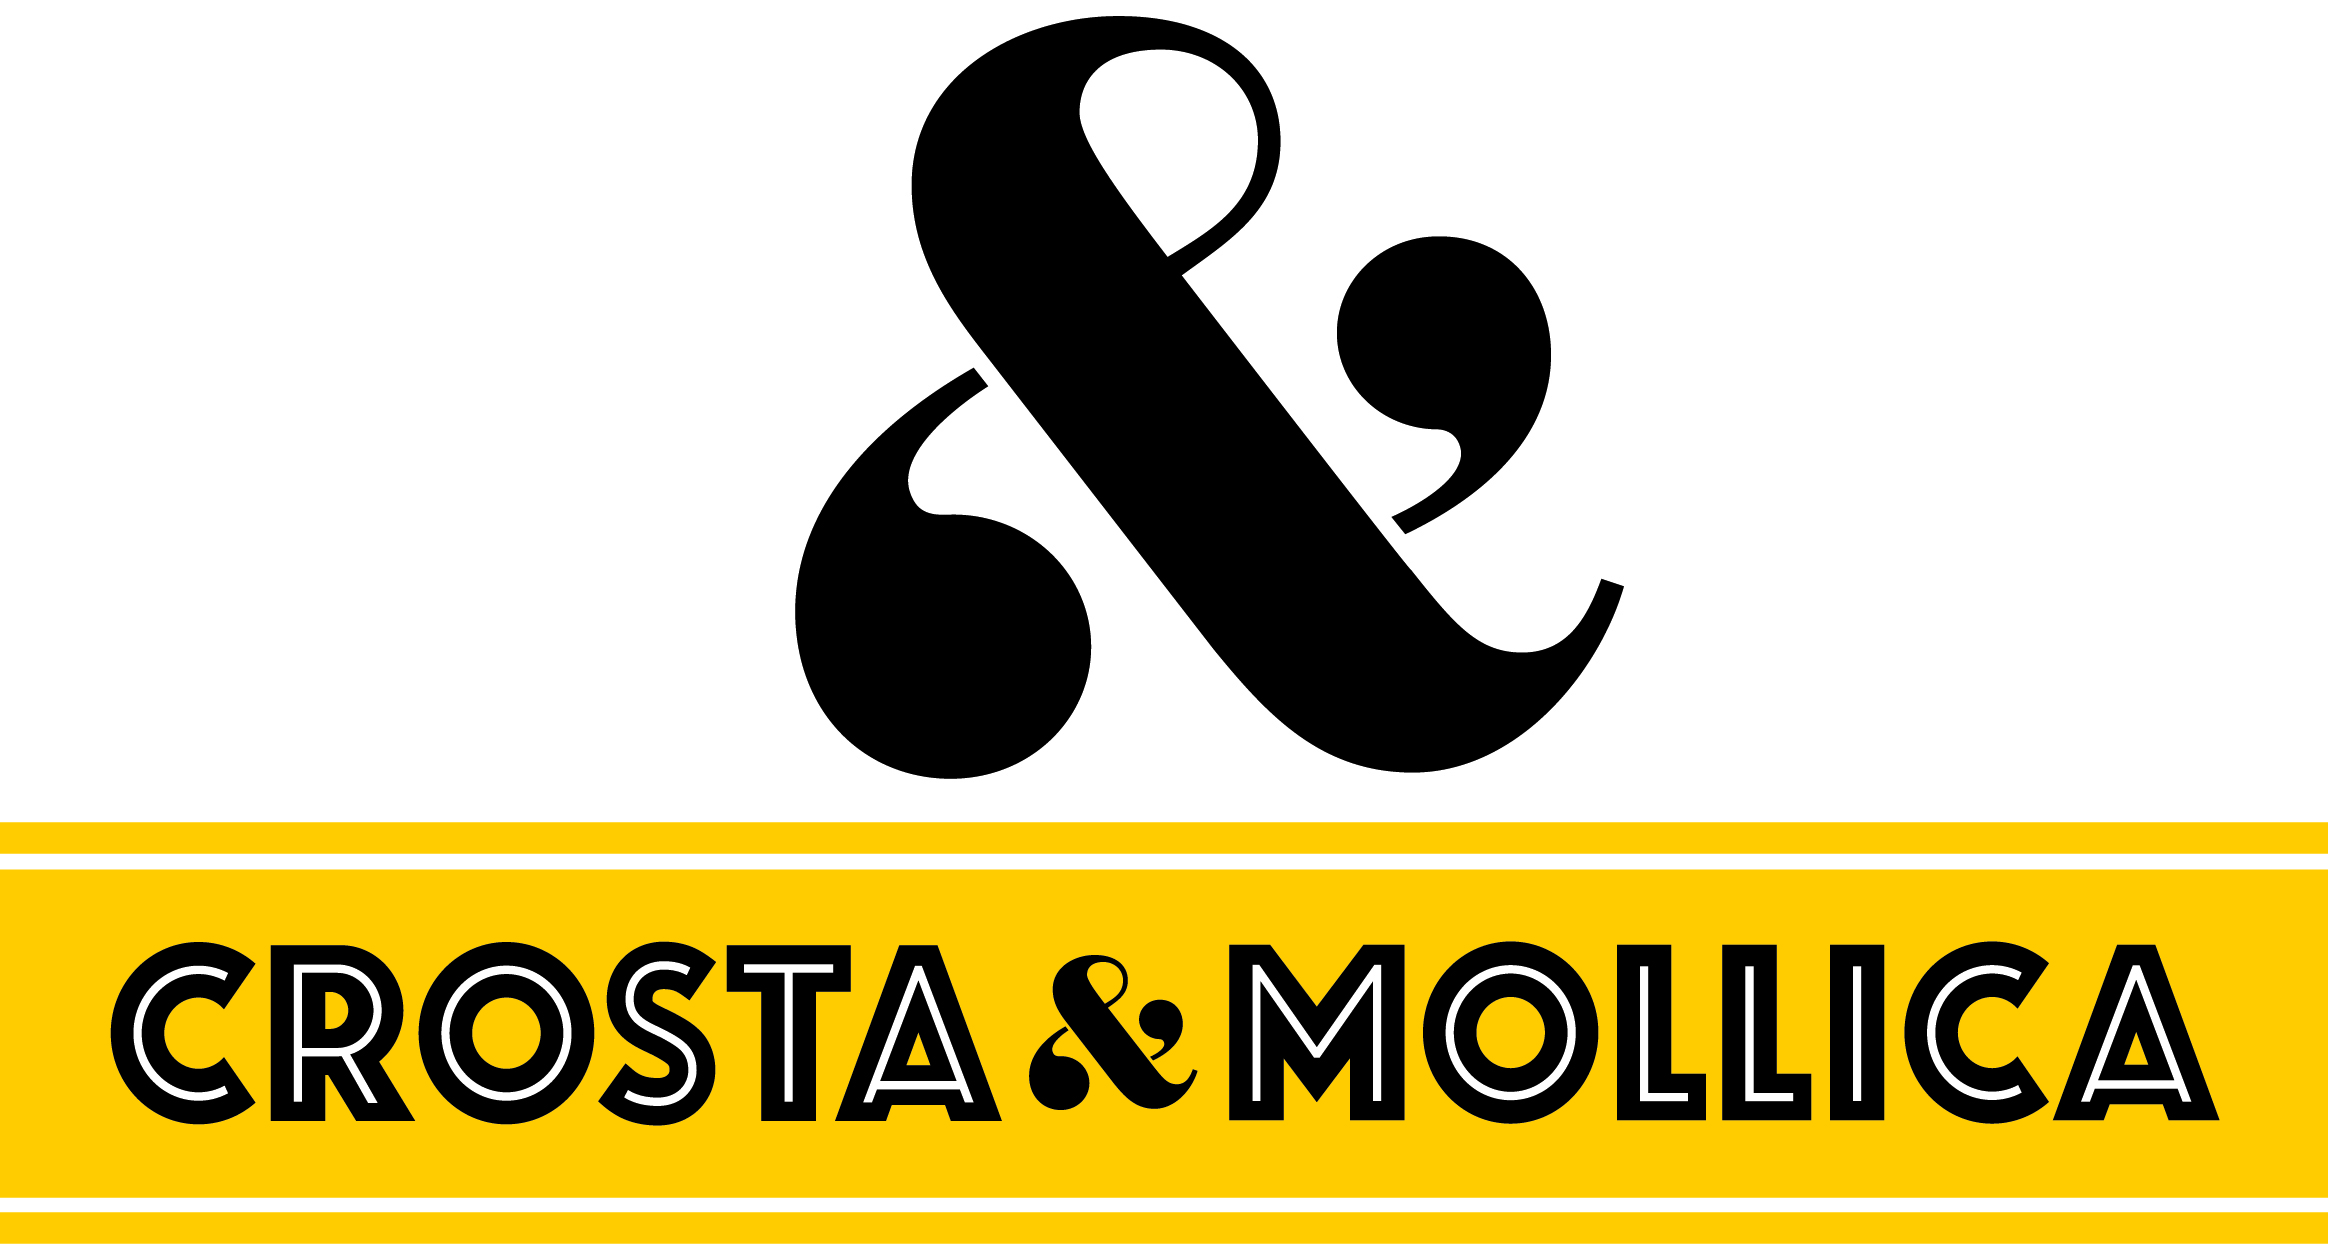 crosta_logo_(2328x1244_cmyk).jpg